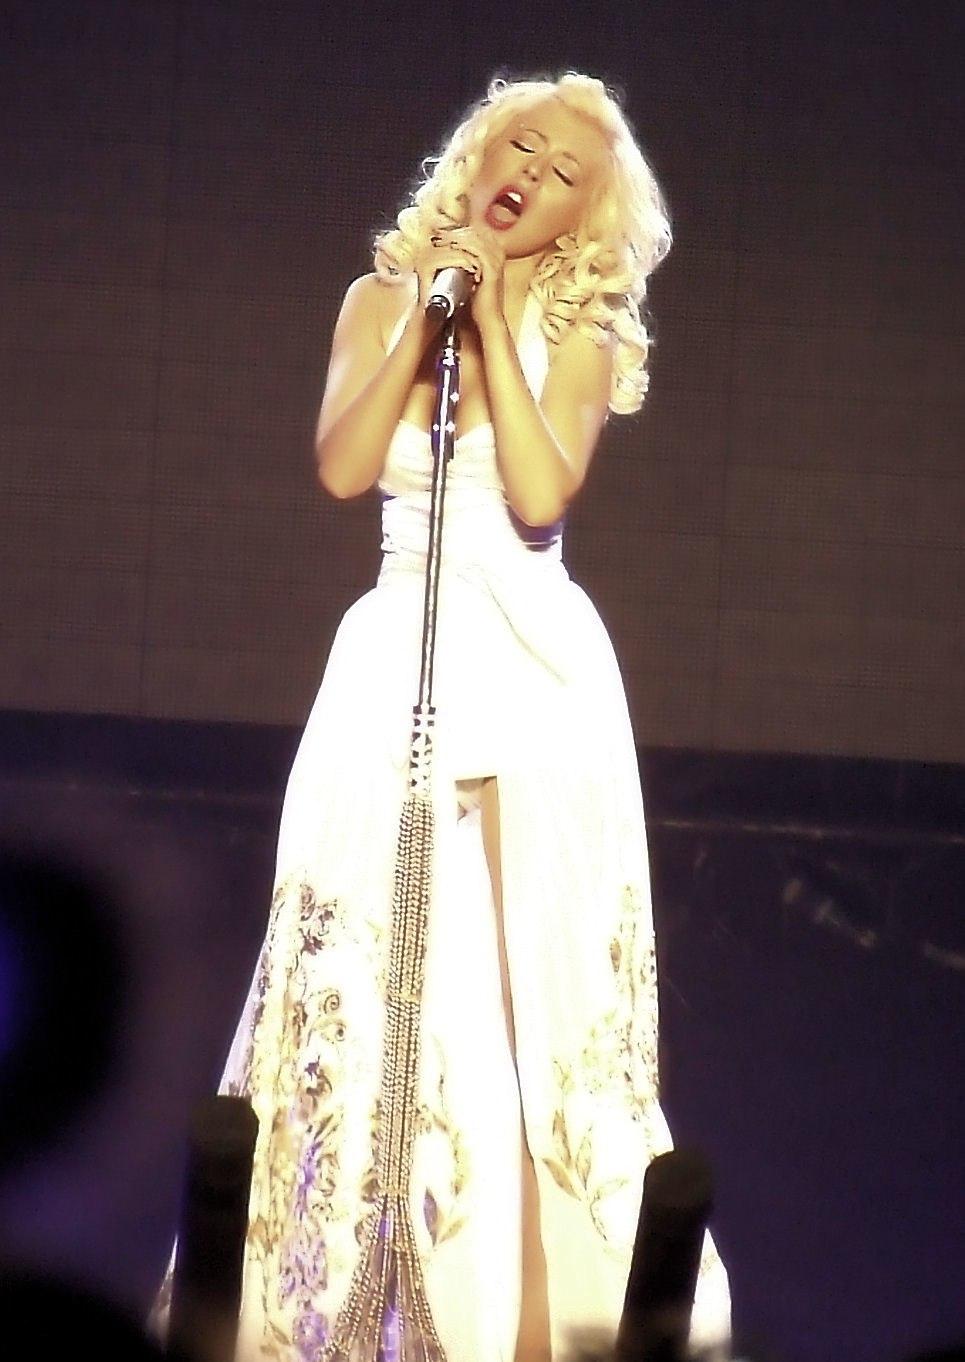 Understand - Christina Aguilera